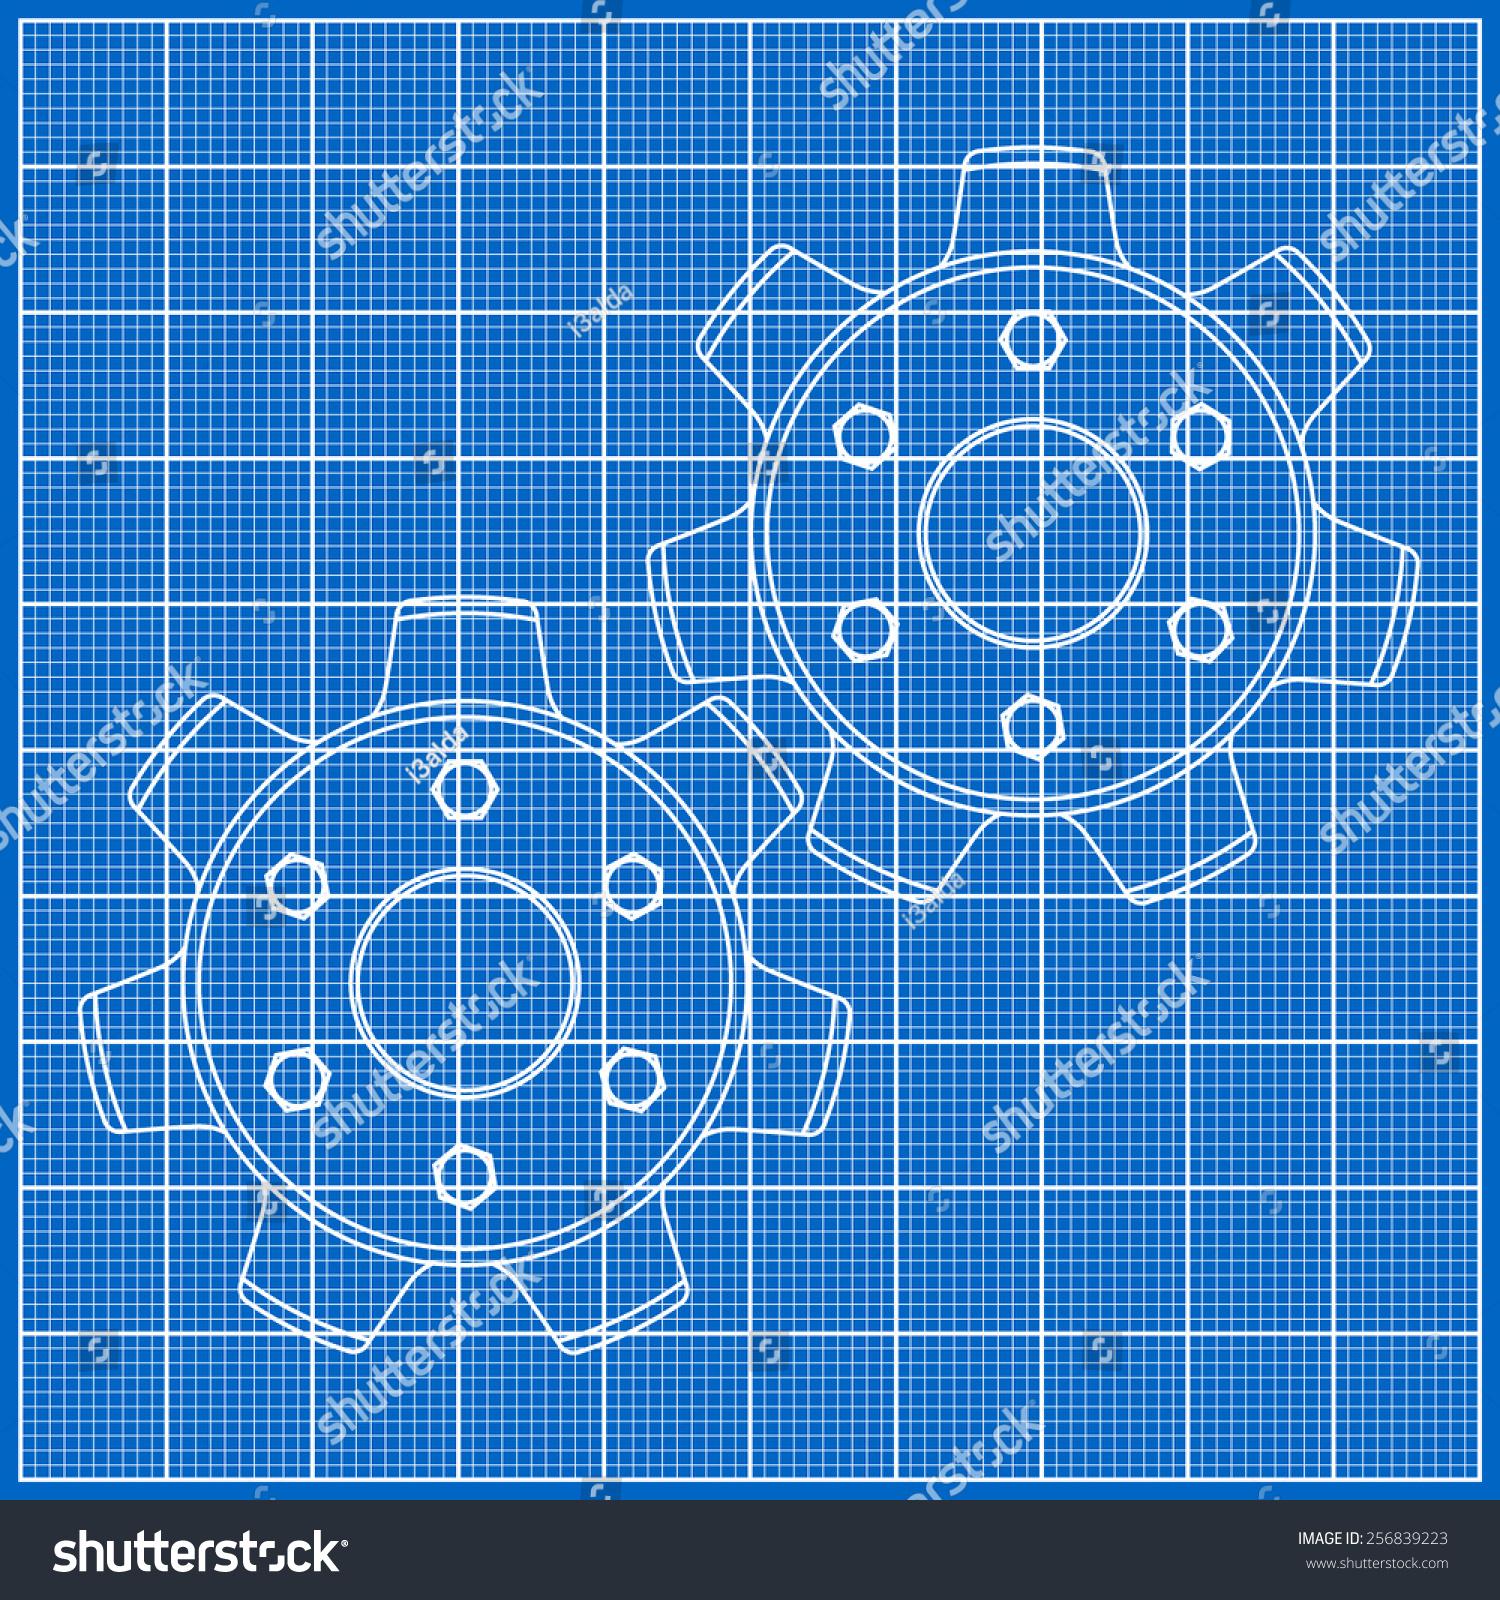 Cogs gears on blueprint paper vector stock photo photo vector cogs gears on blueprint paper vector illustration malvernweather Gallery